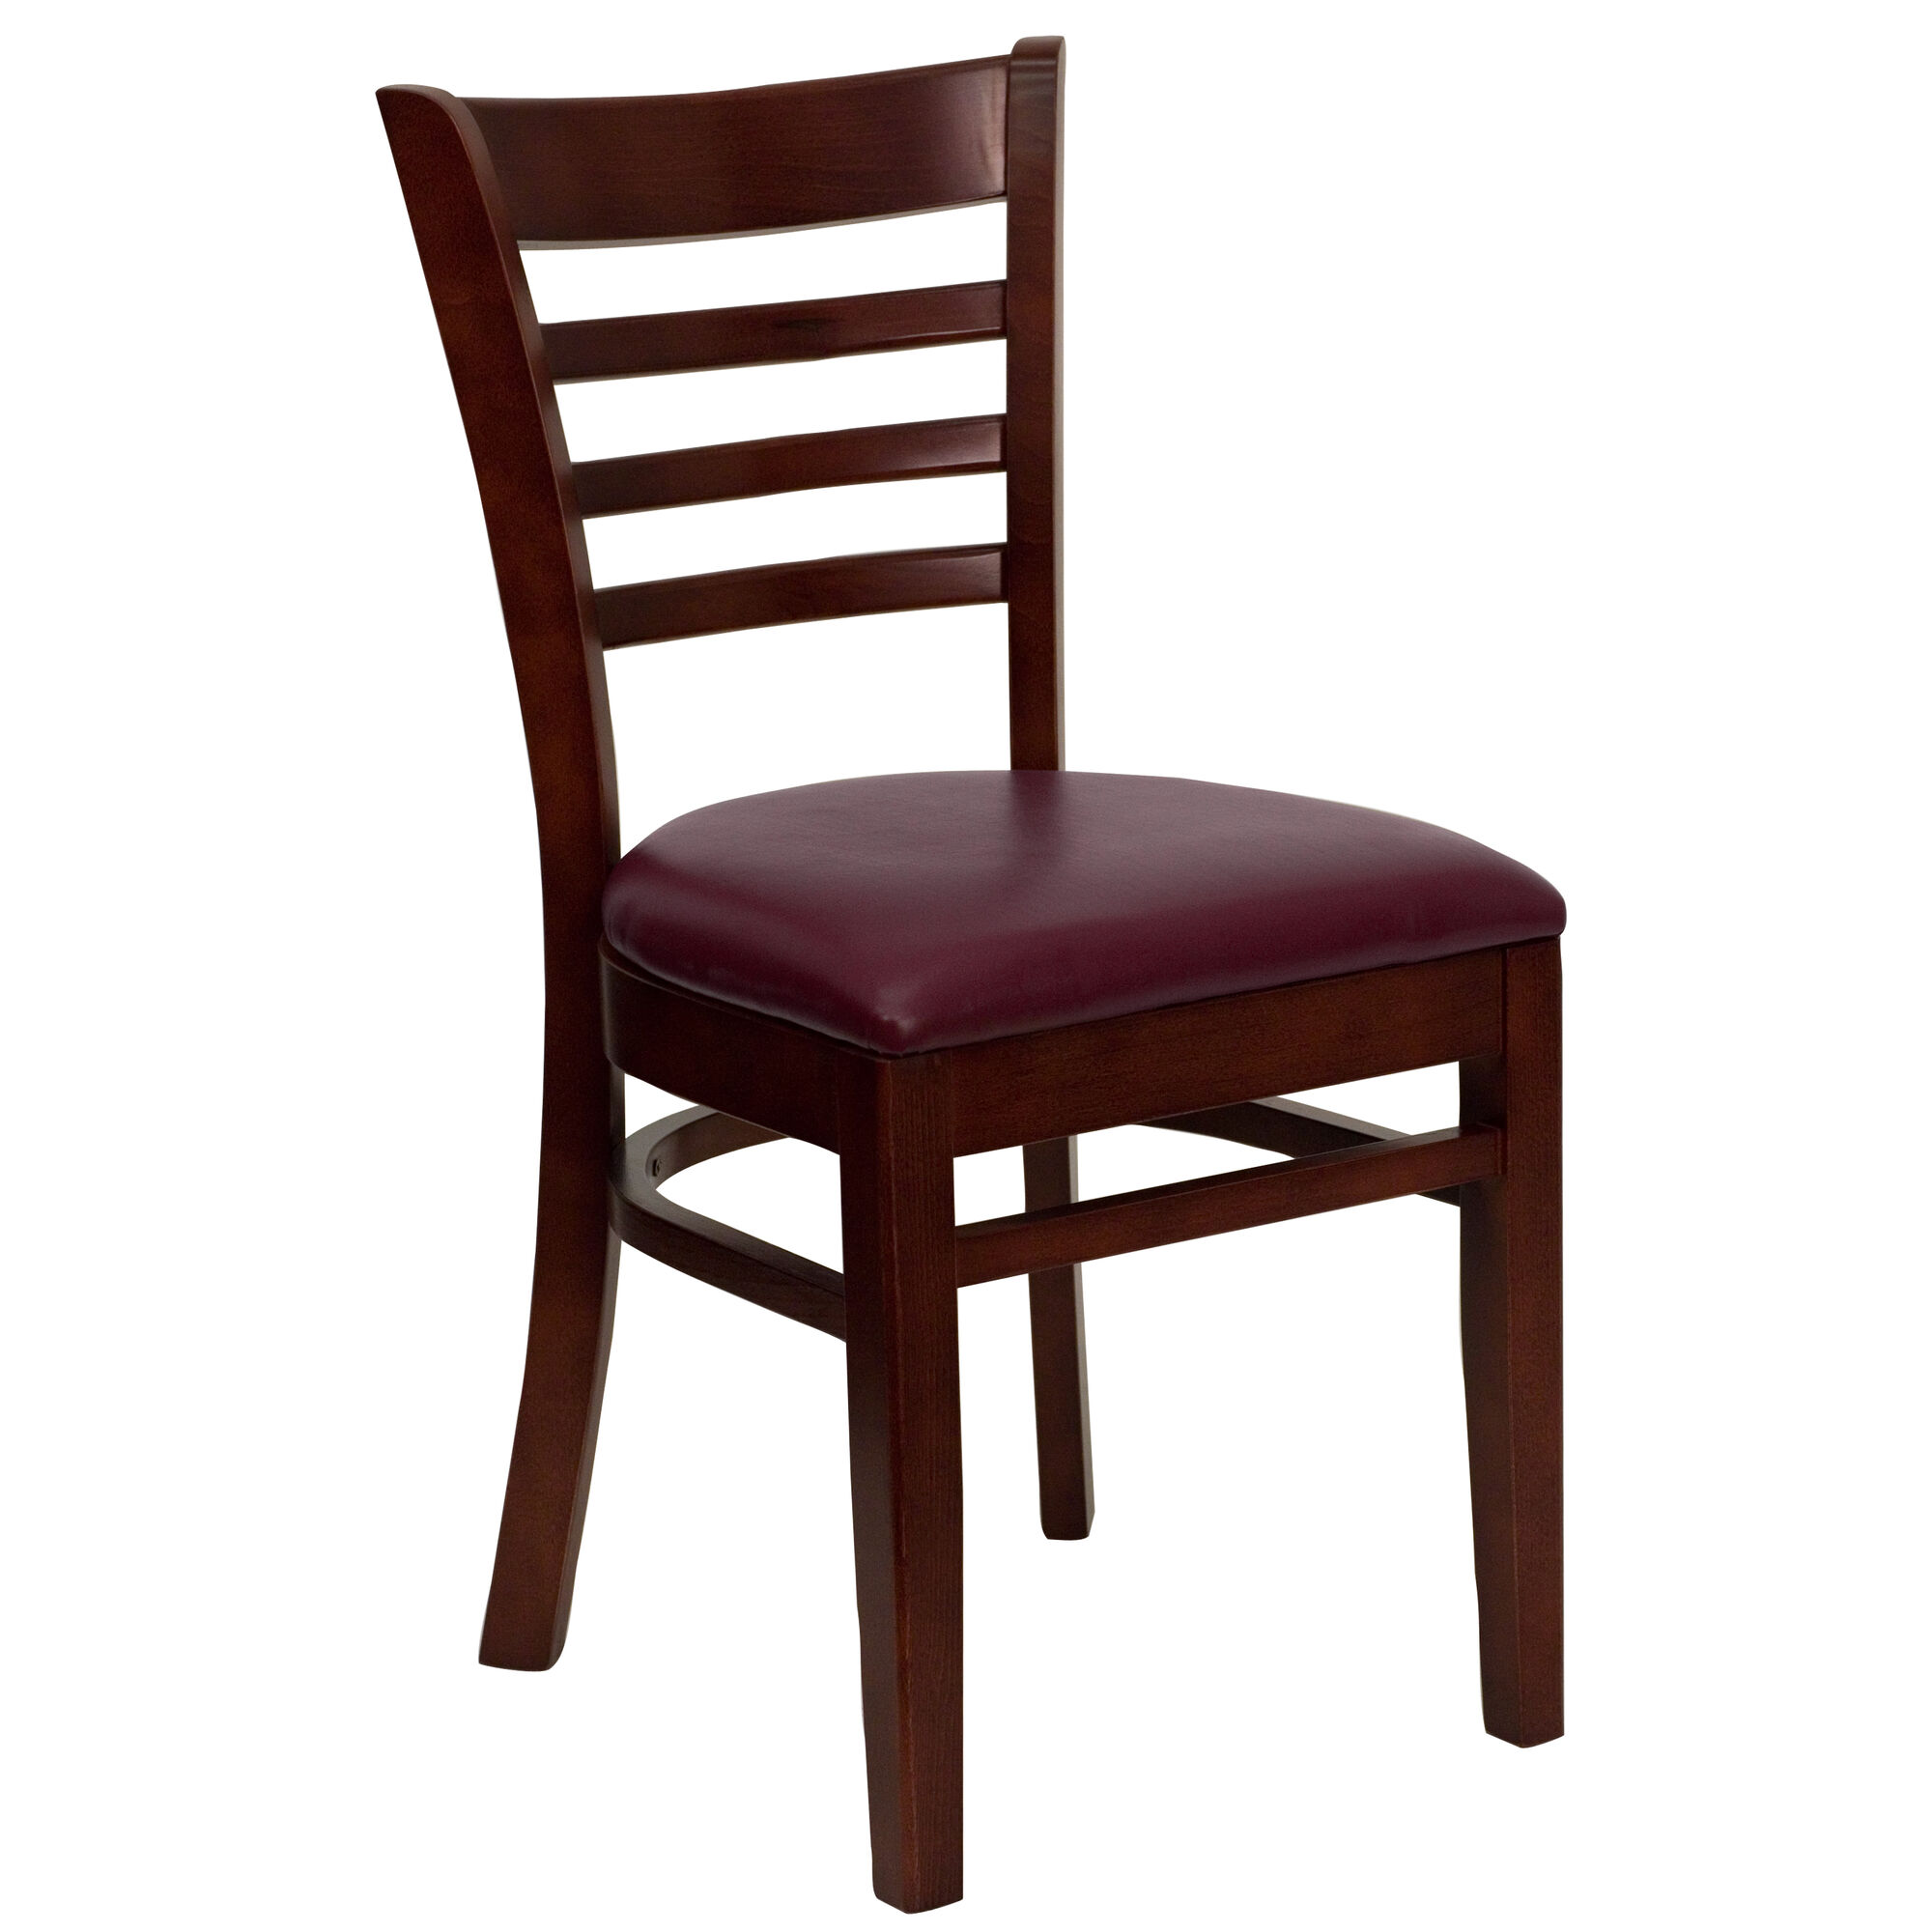 Mahogany Wood Chair Burg Vinyl BFDH 8241MBY TDR